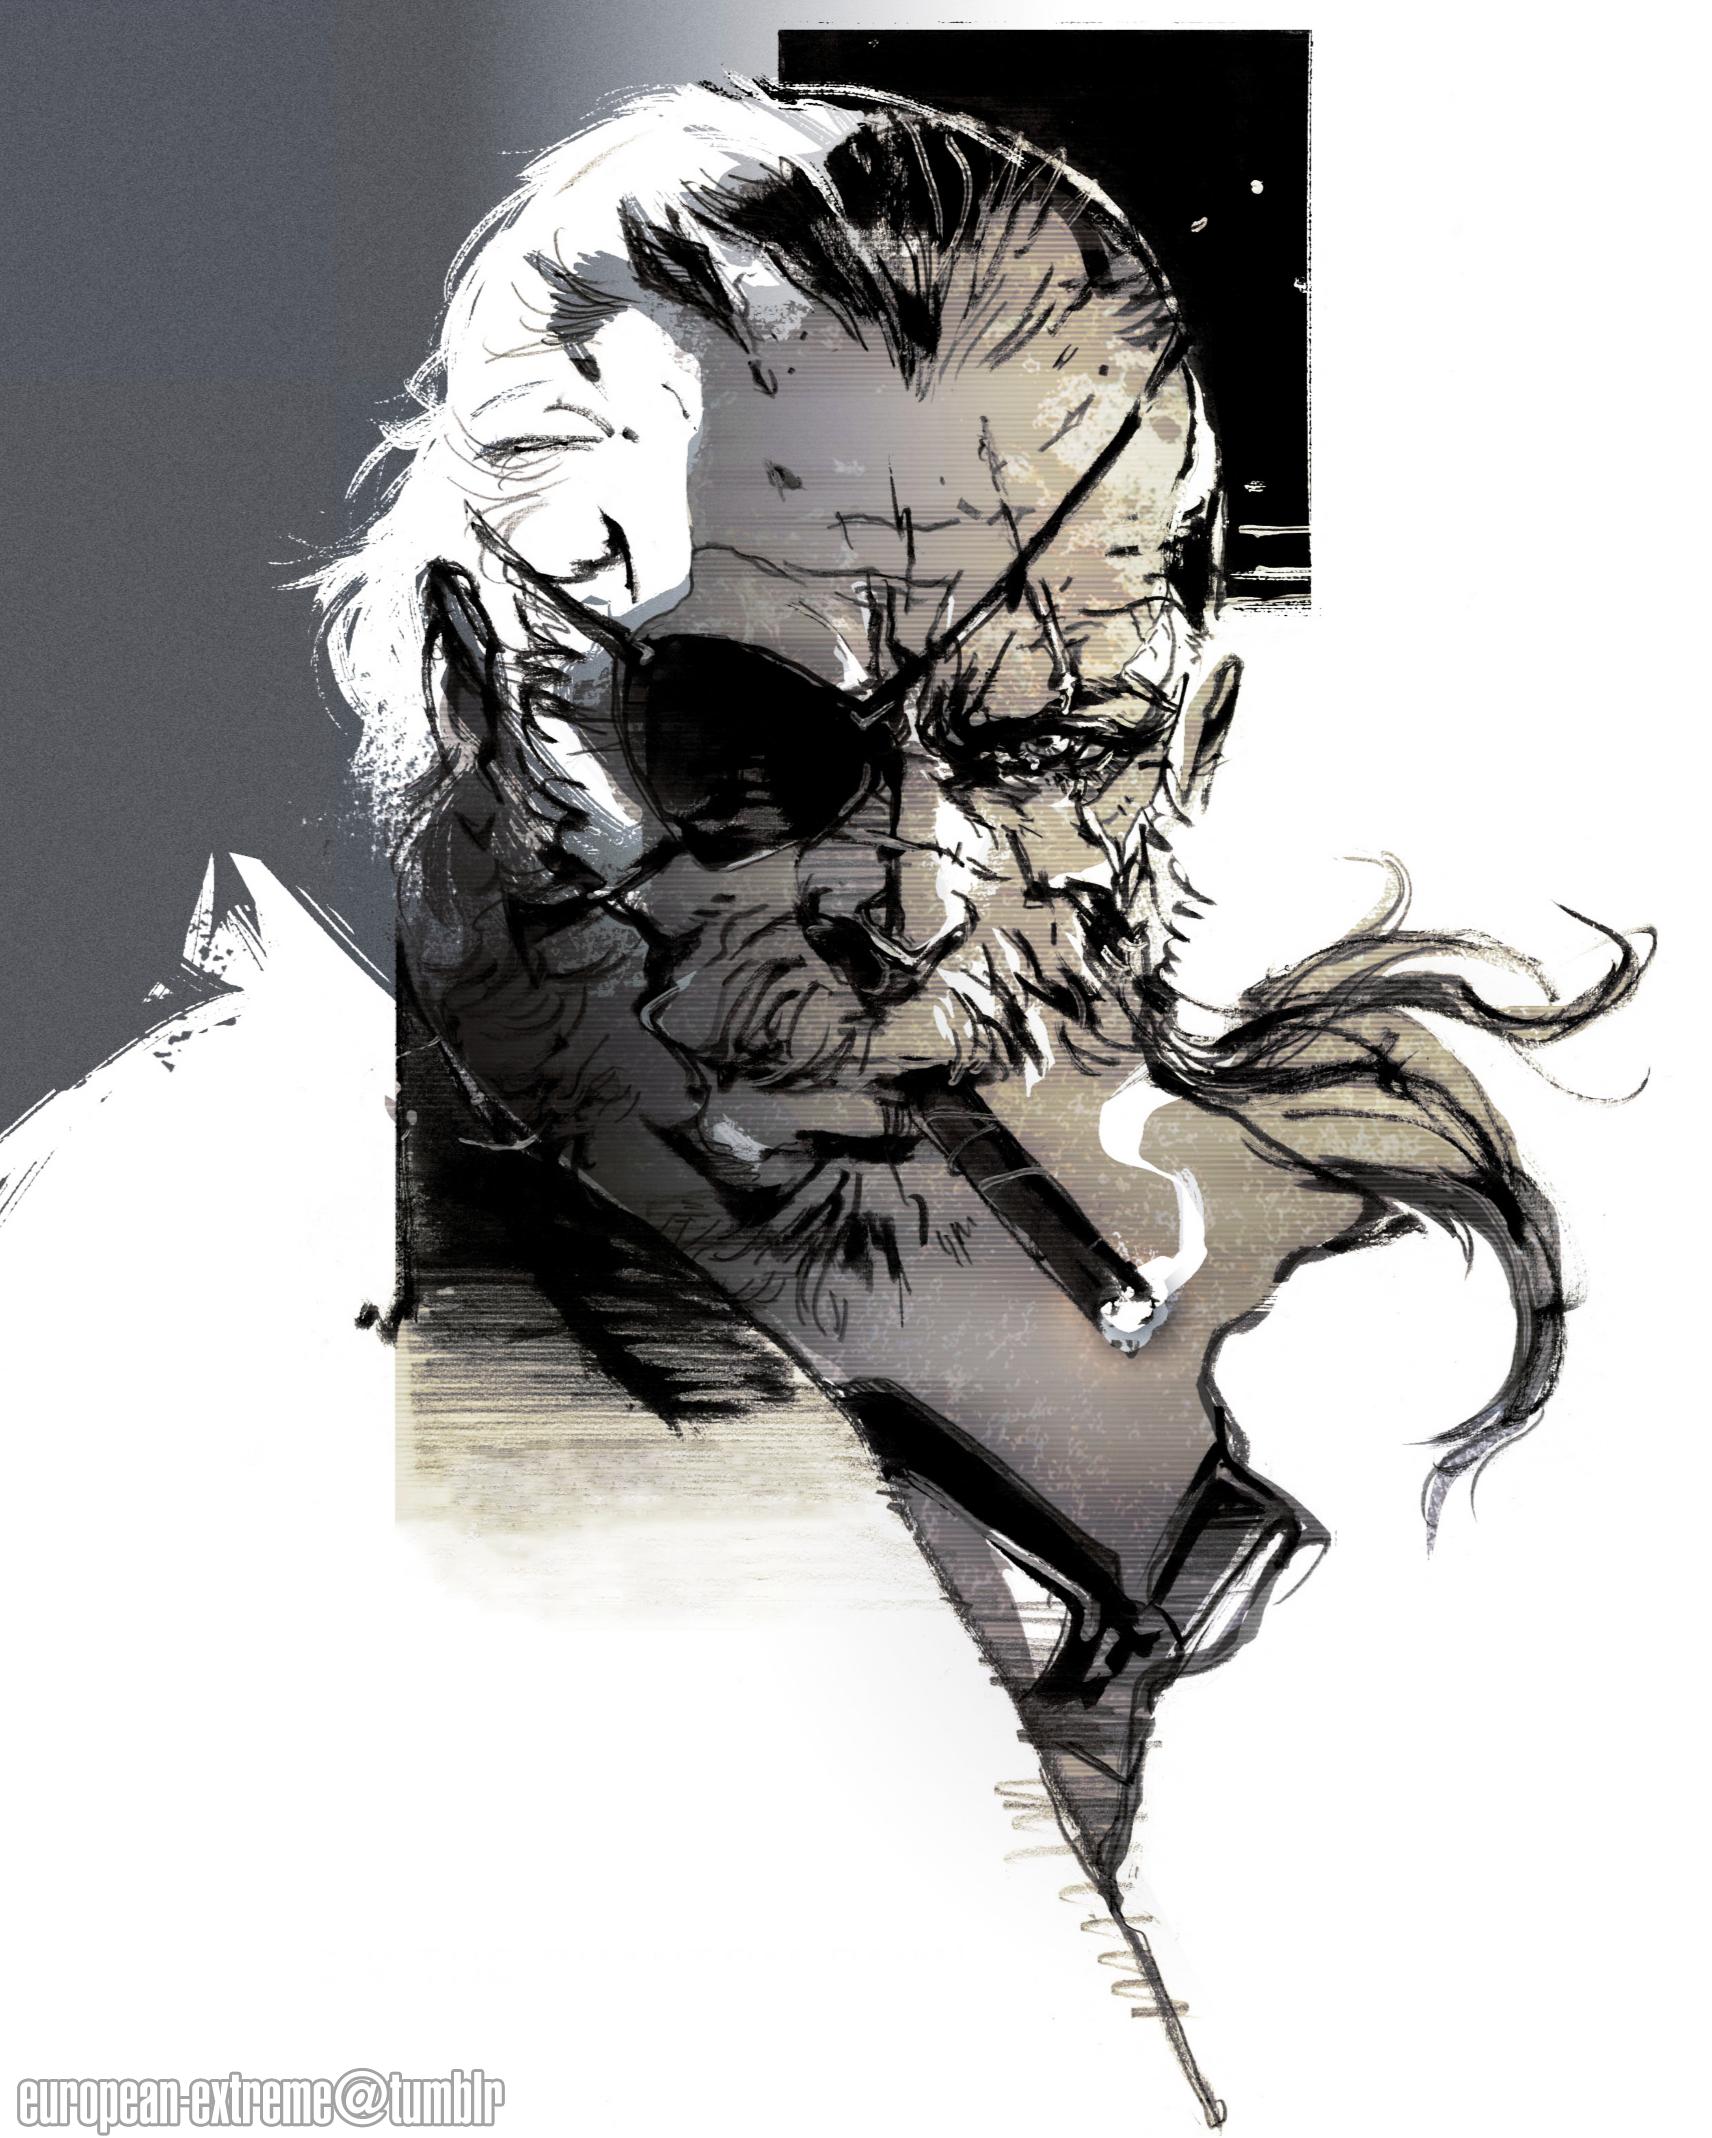 Video Game Metal Gear Rising Revengeance Wallpaper Metal Gear Rising Metal Gear Solid Metal Gear